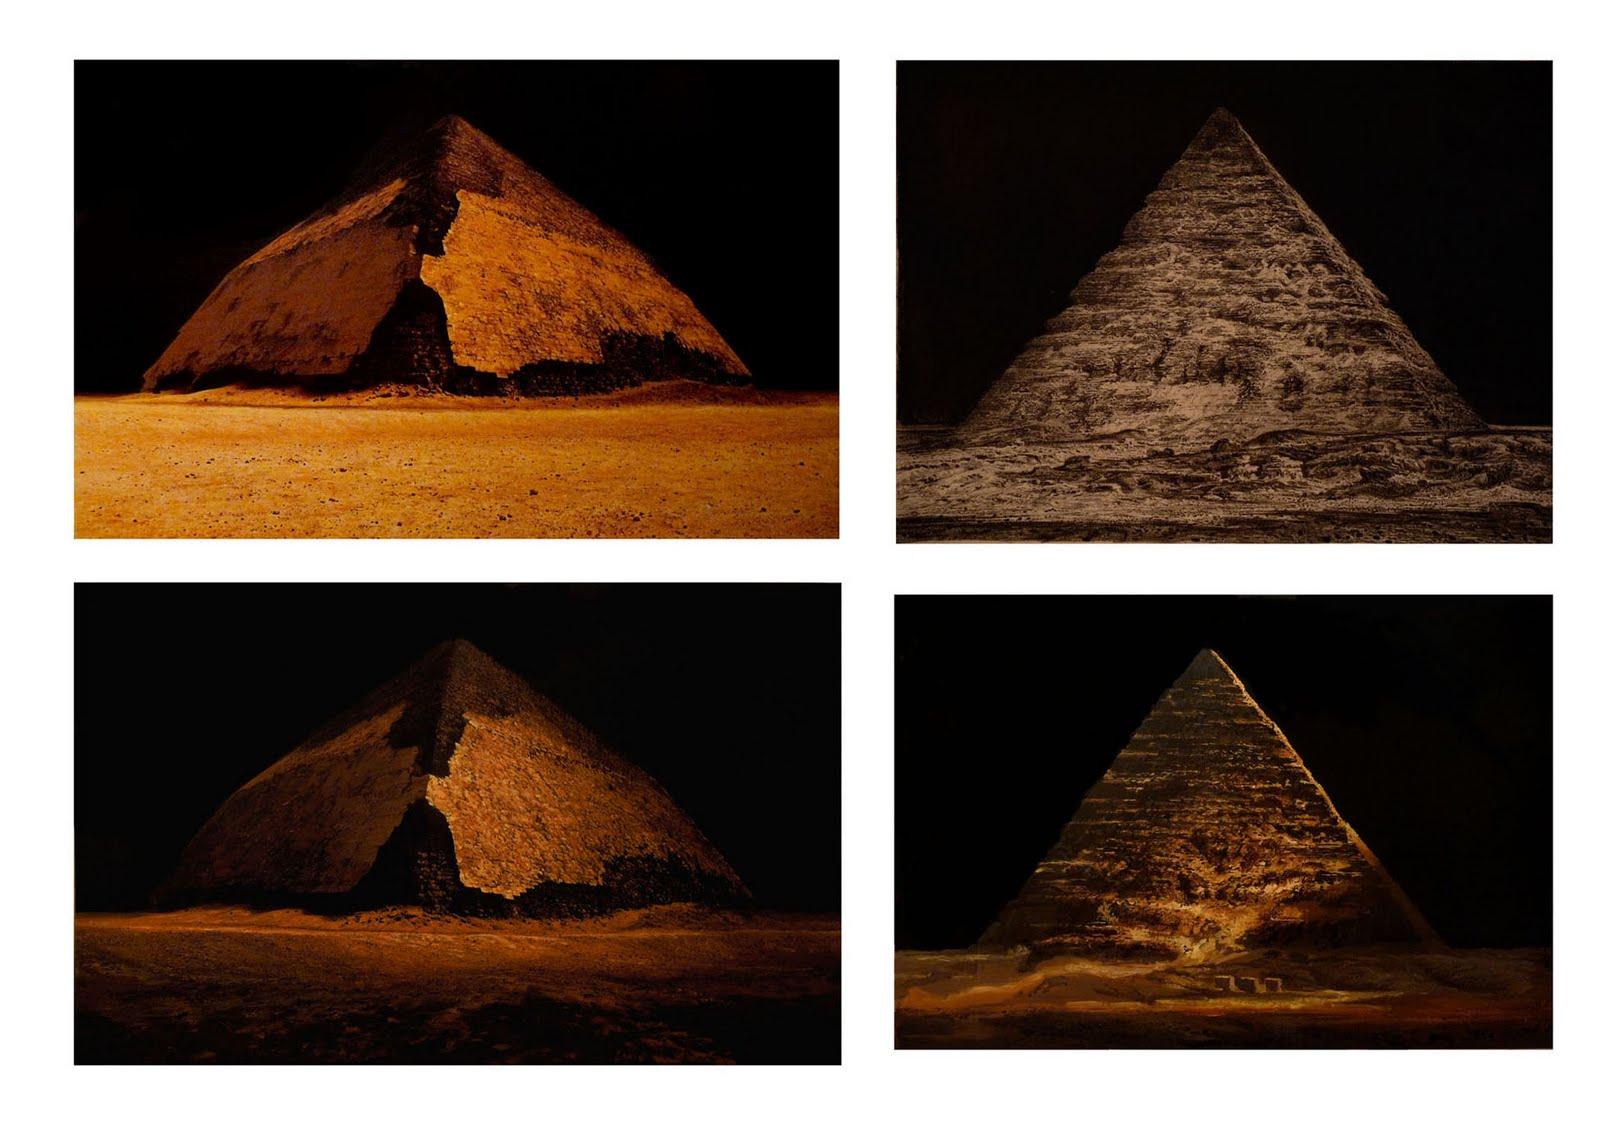 http://2.bp.blogspot.com/_EV4v34UIE-A/THGDh3QjCHI/AAAAAAAAAEY/QqTMcyTrR9U/s1600/pyramidesweb.jpg